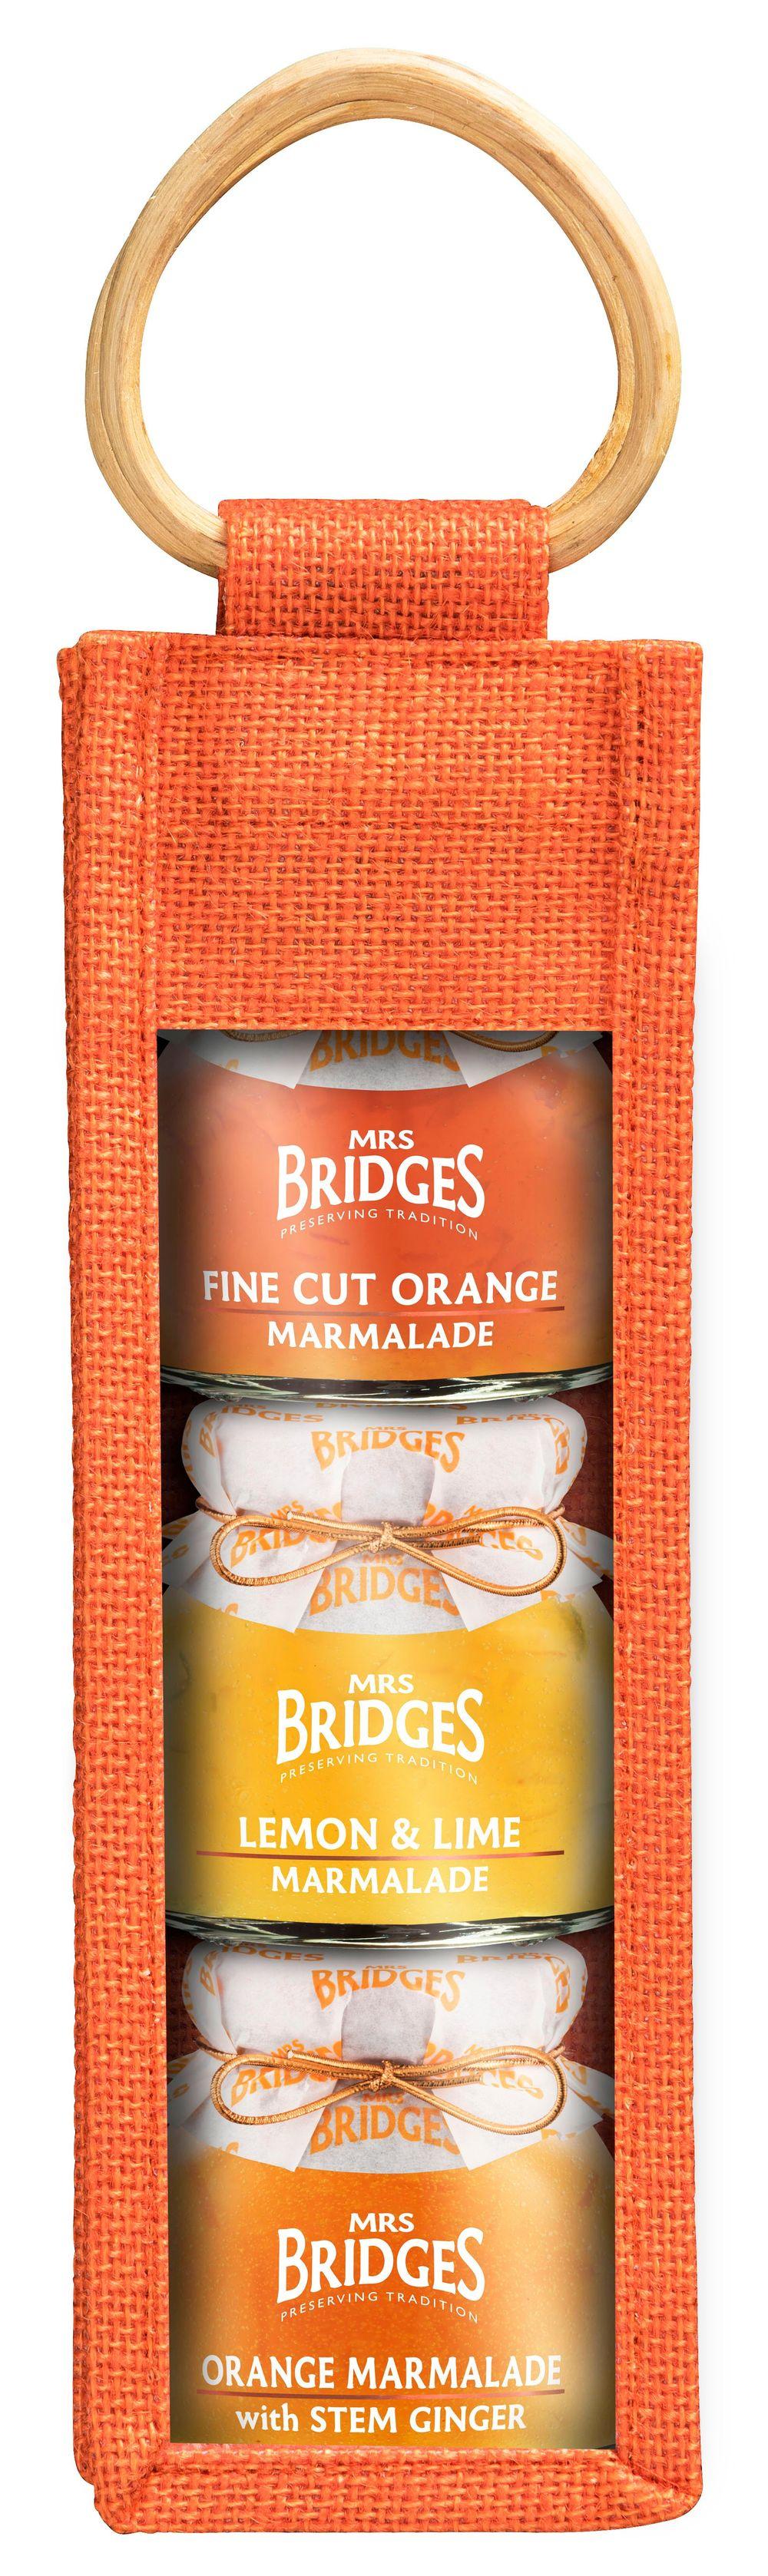 Triple Jar Jute Bag - Marmalade Collection